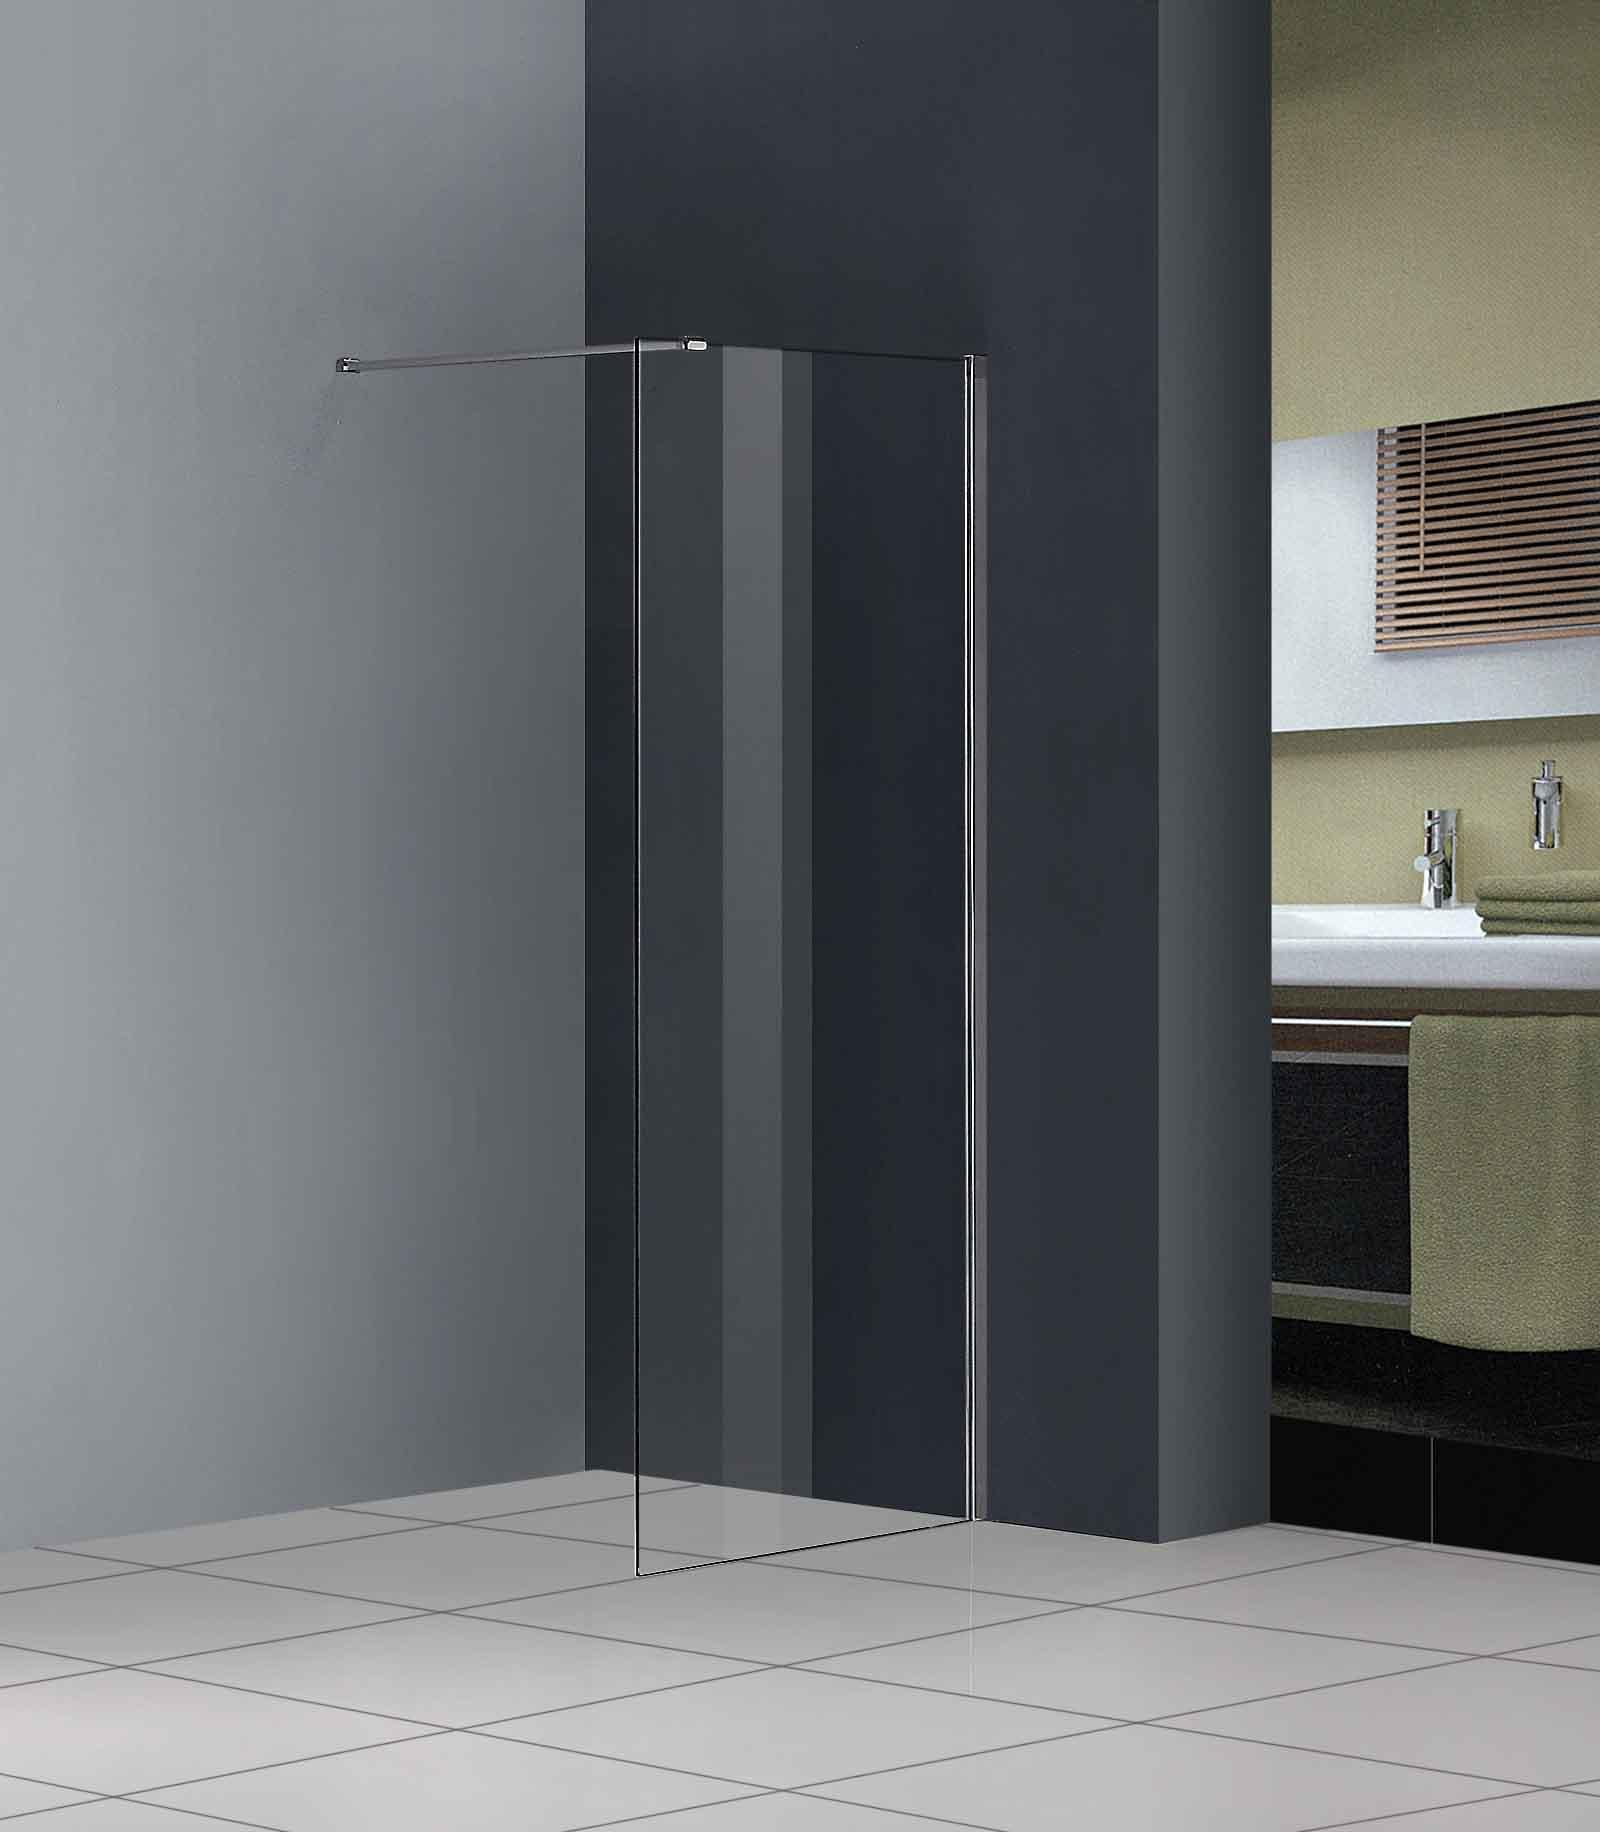 Details About 8mm Easyclean Glass Shower Enclosure Wet Room Walk In Door Cubicle Panel Cubicle